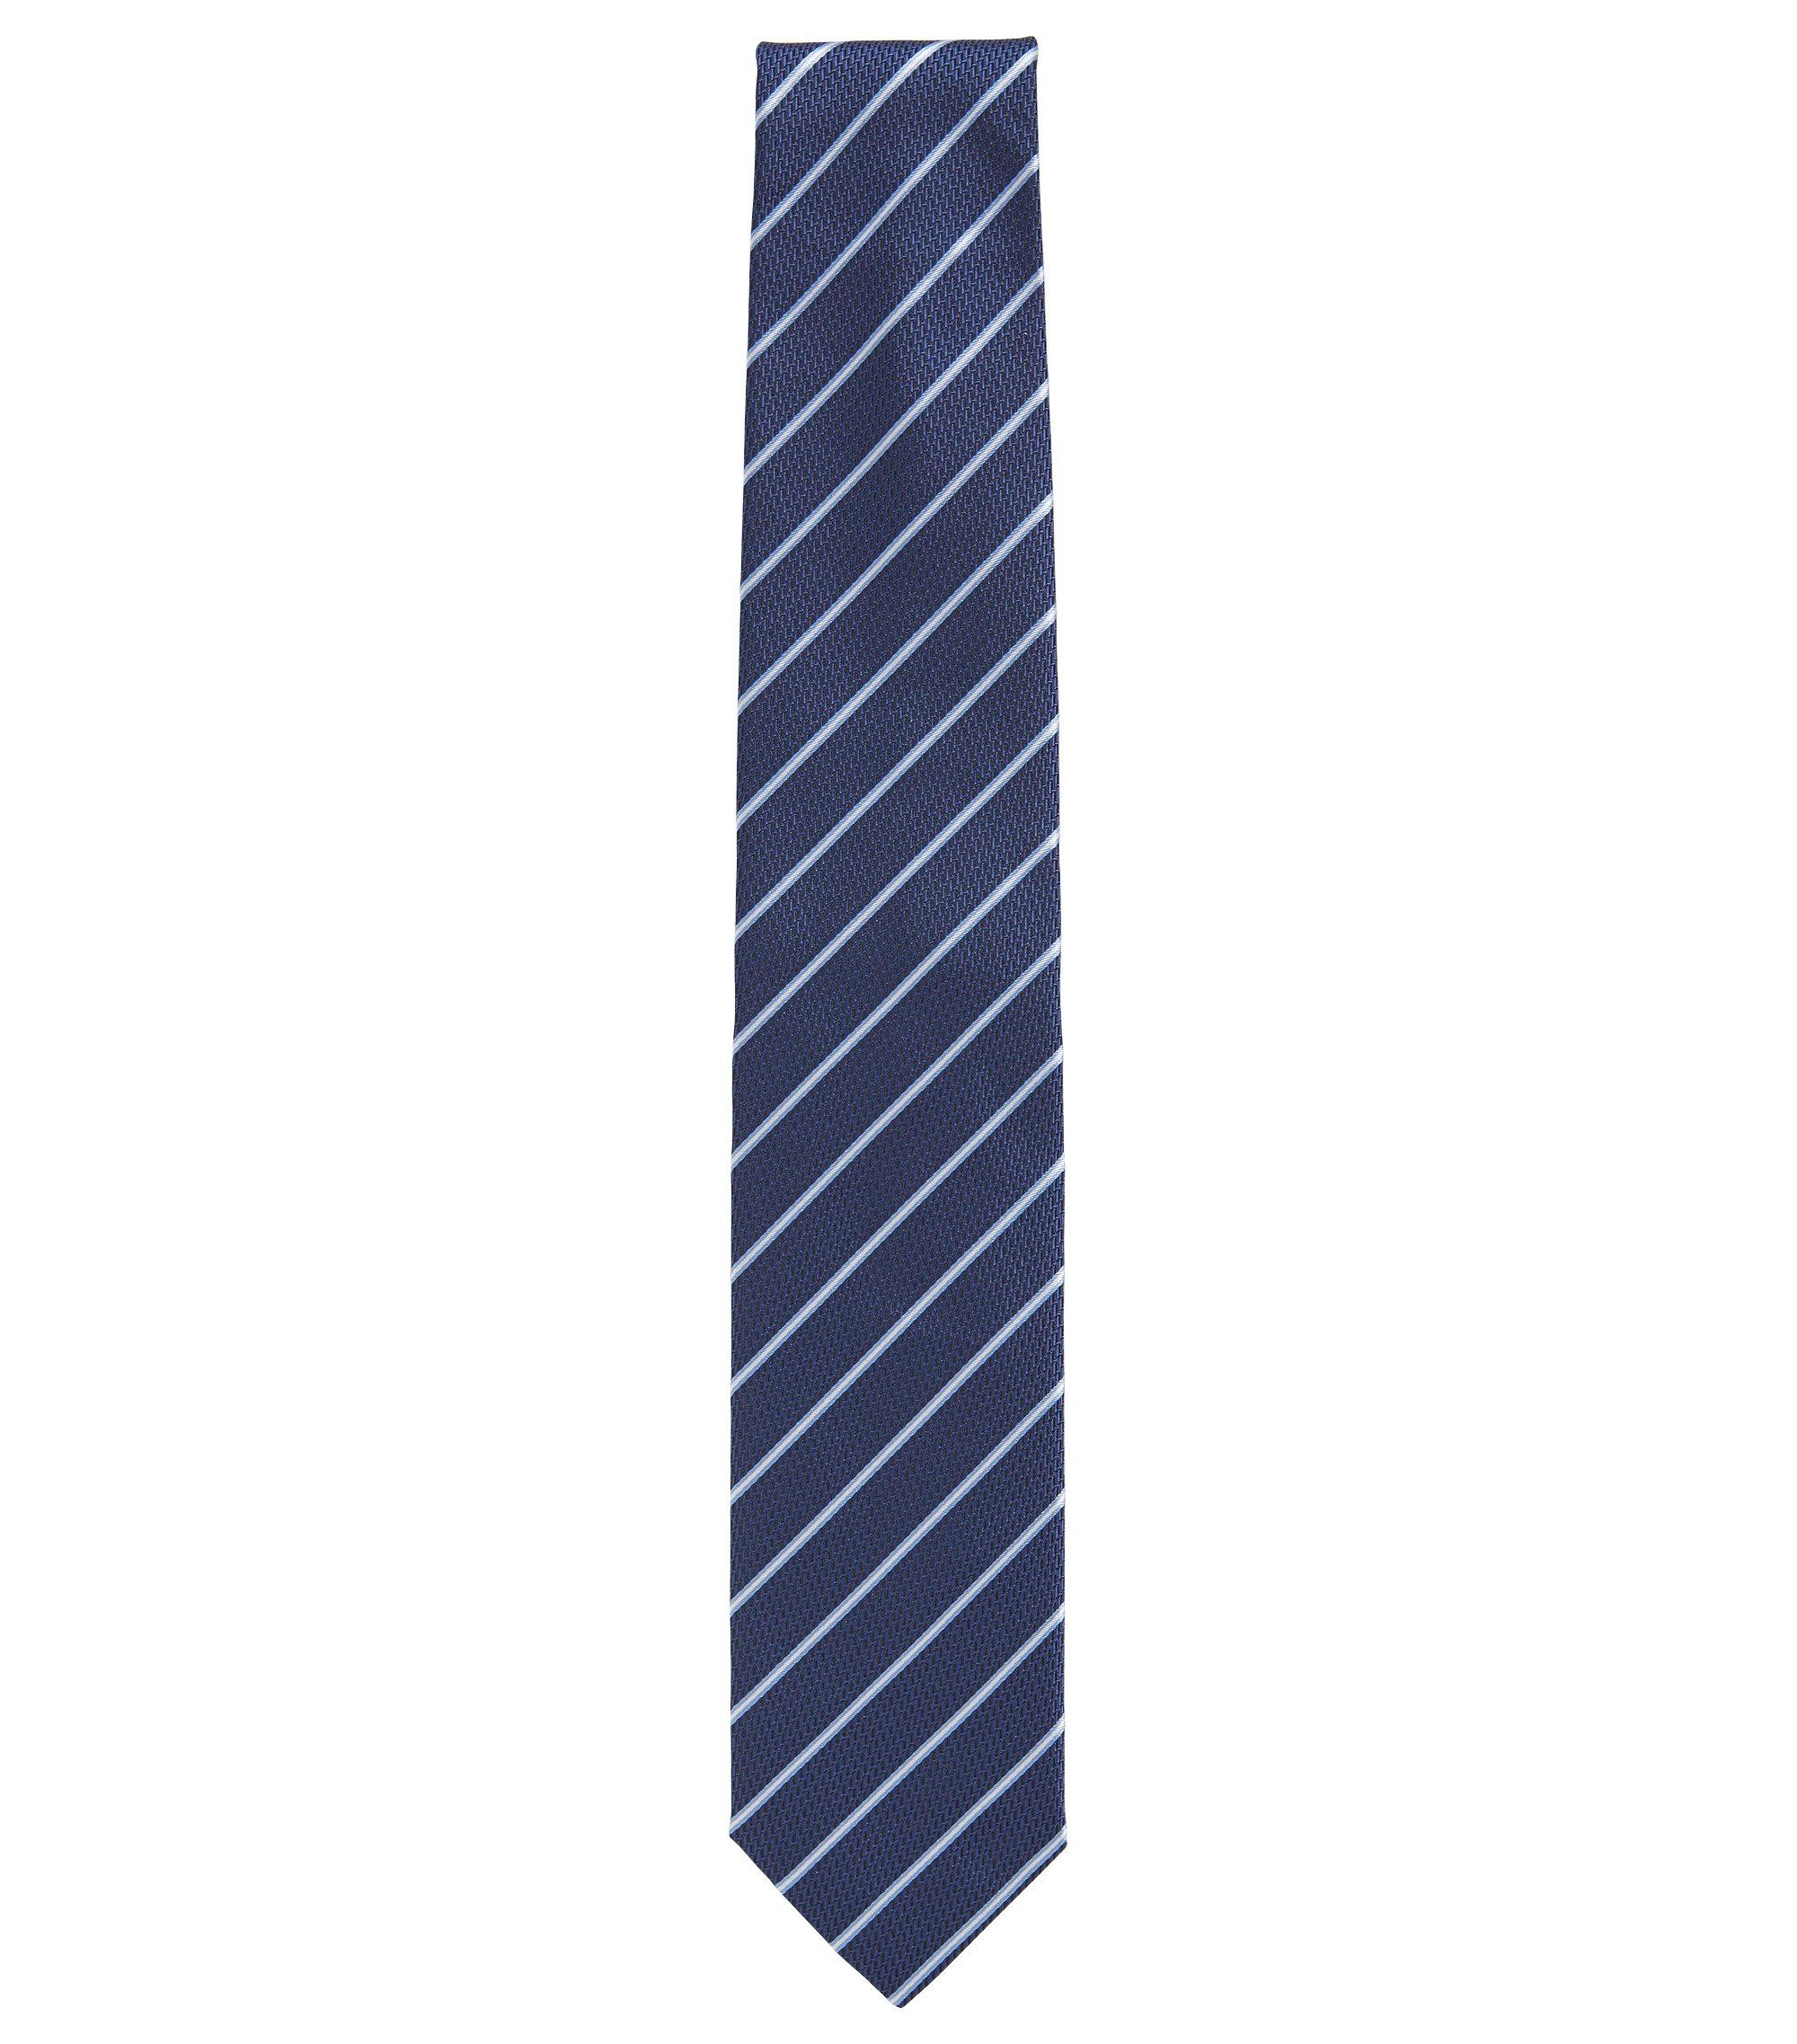 Gestreifte Krawatte aus Seiden-Jacquard, Dunkelblau